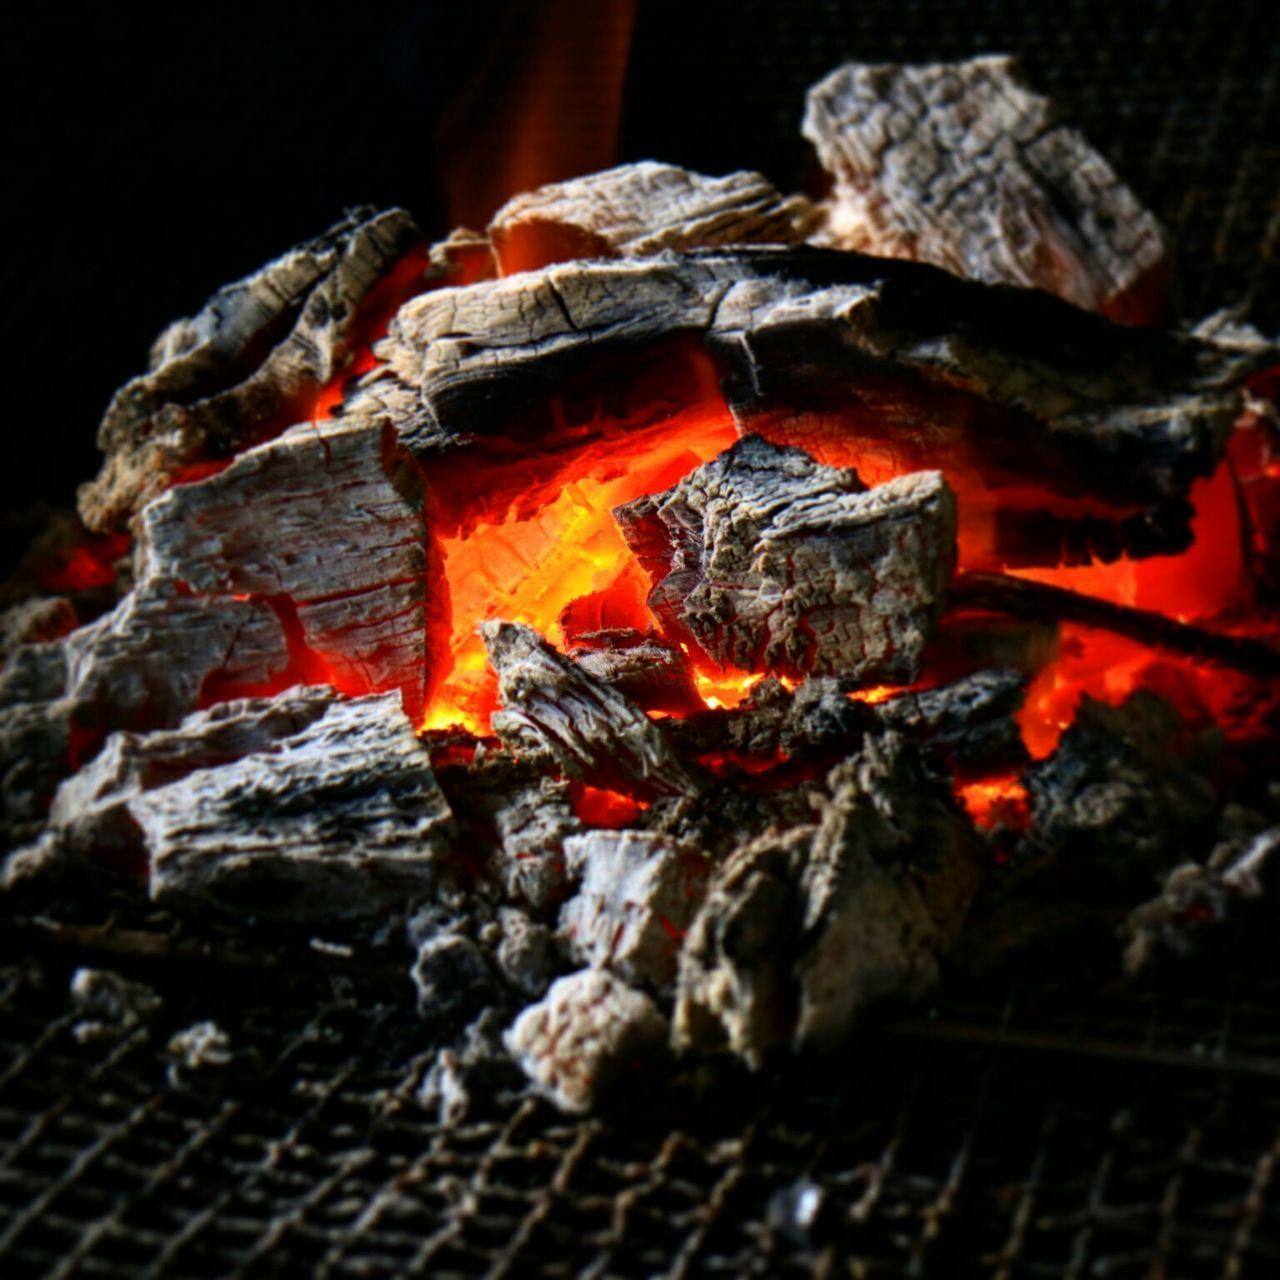 night, coal, outdoors, flame, burning, no people, close-up, wood - material, heat - temperature